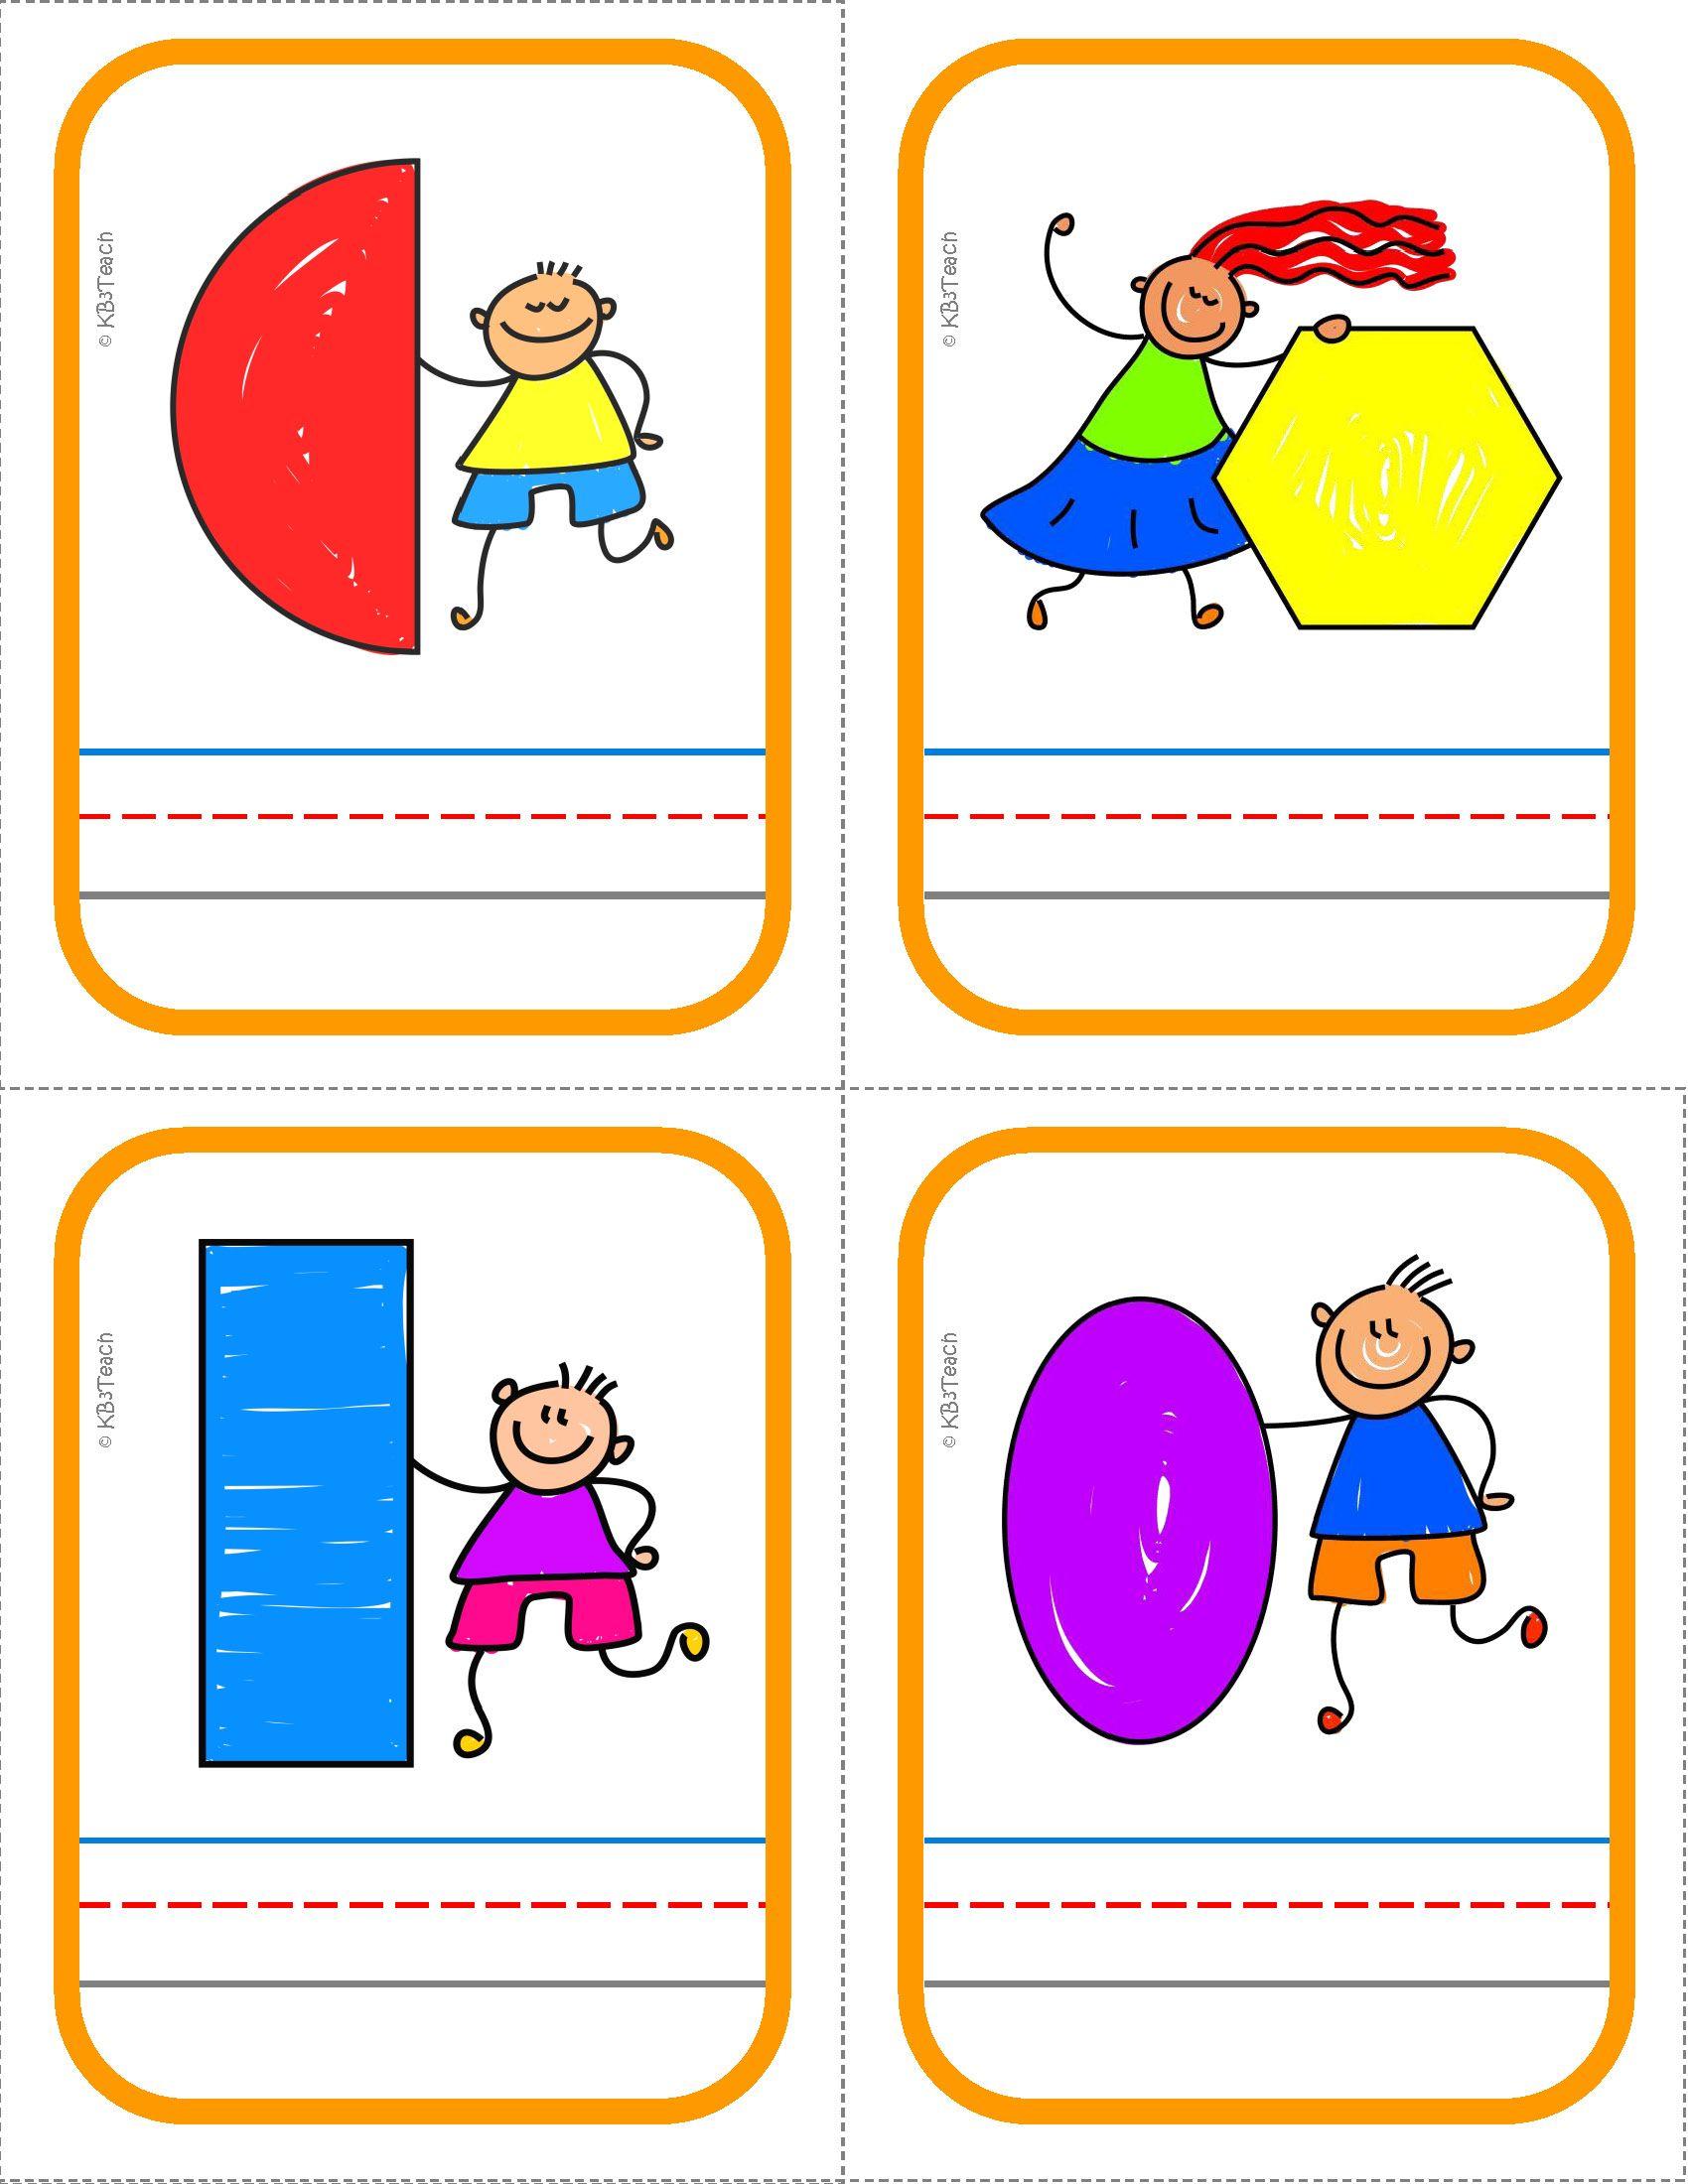 Worksheet Shapes Flashcards Worksheet Fun Worksheet